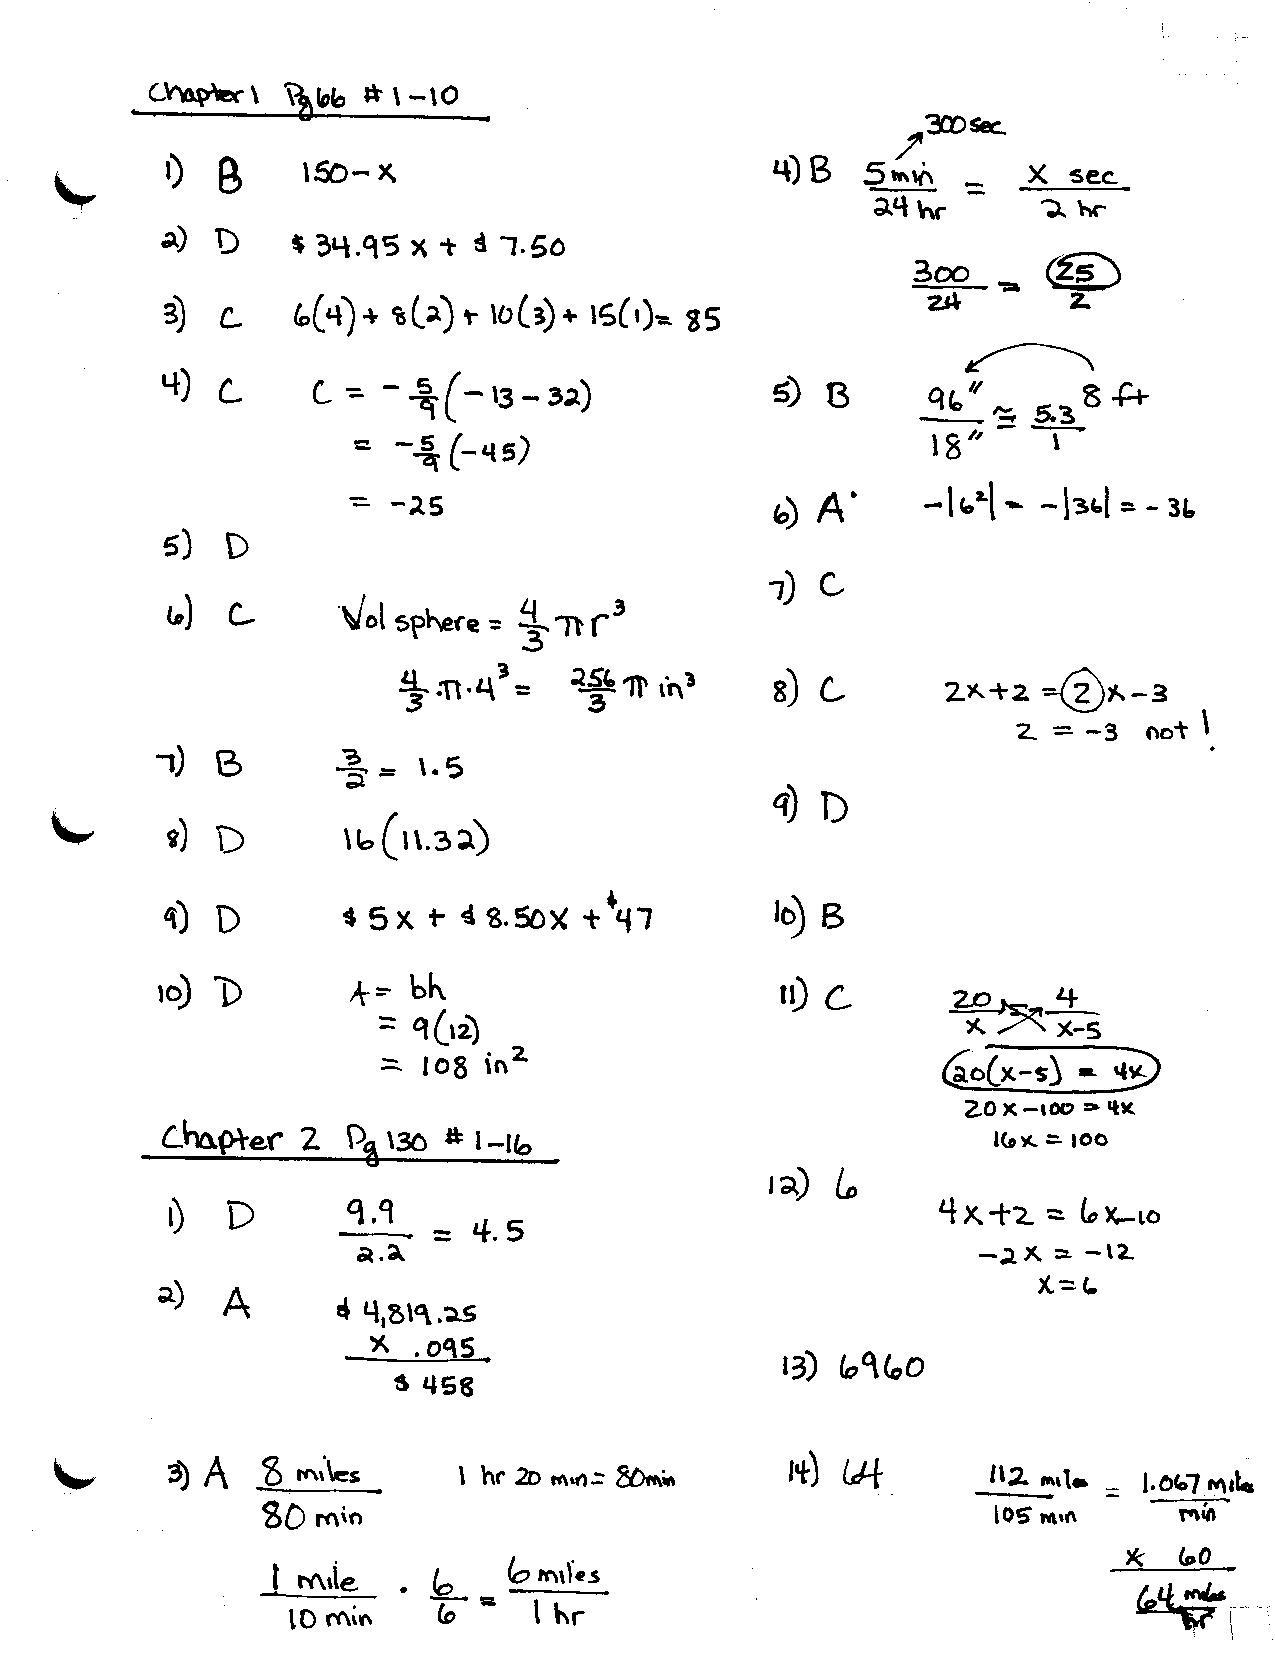 Homework Help Algebra 1 Holt - CHEAT SHEET